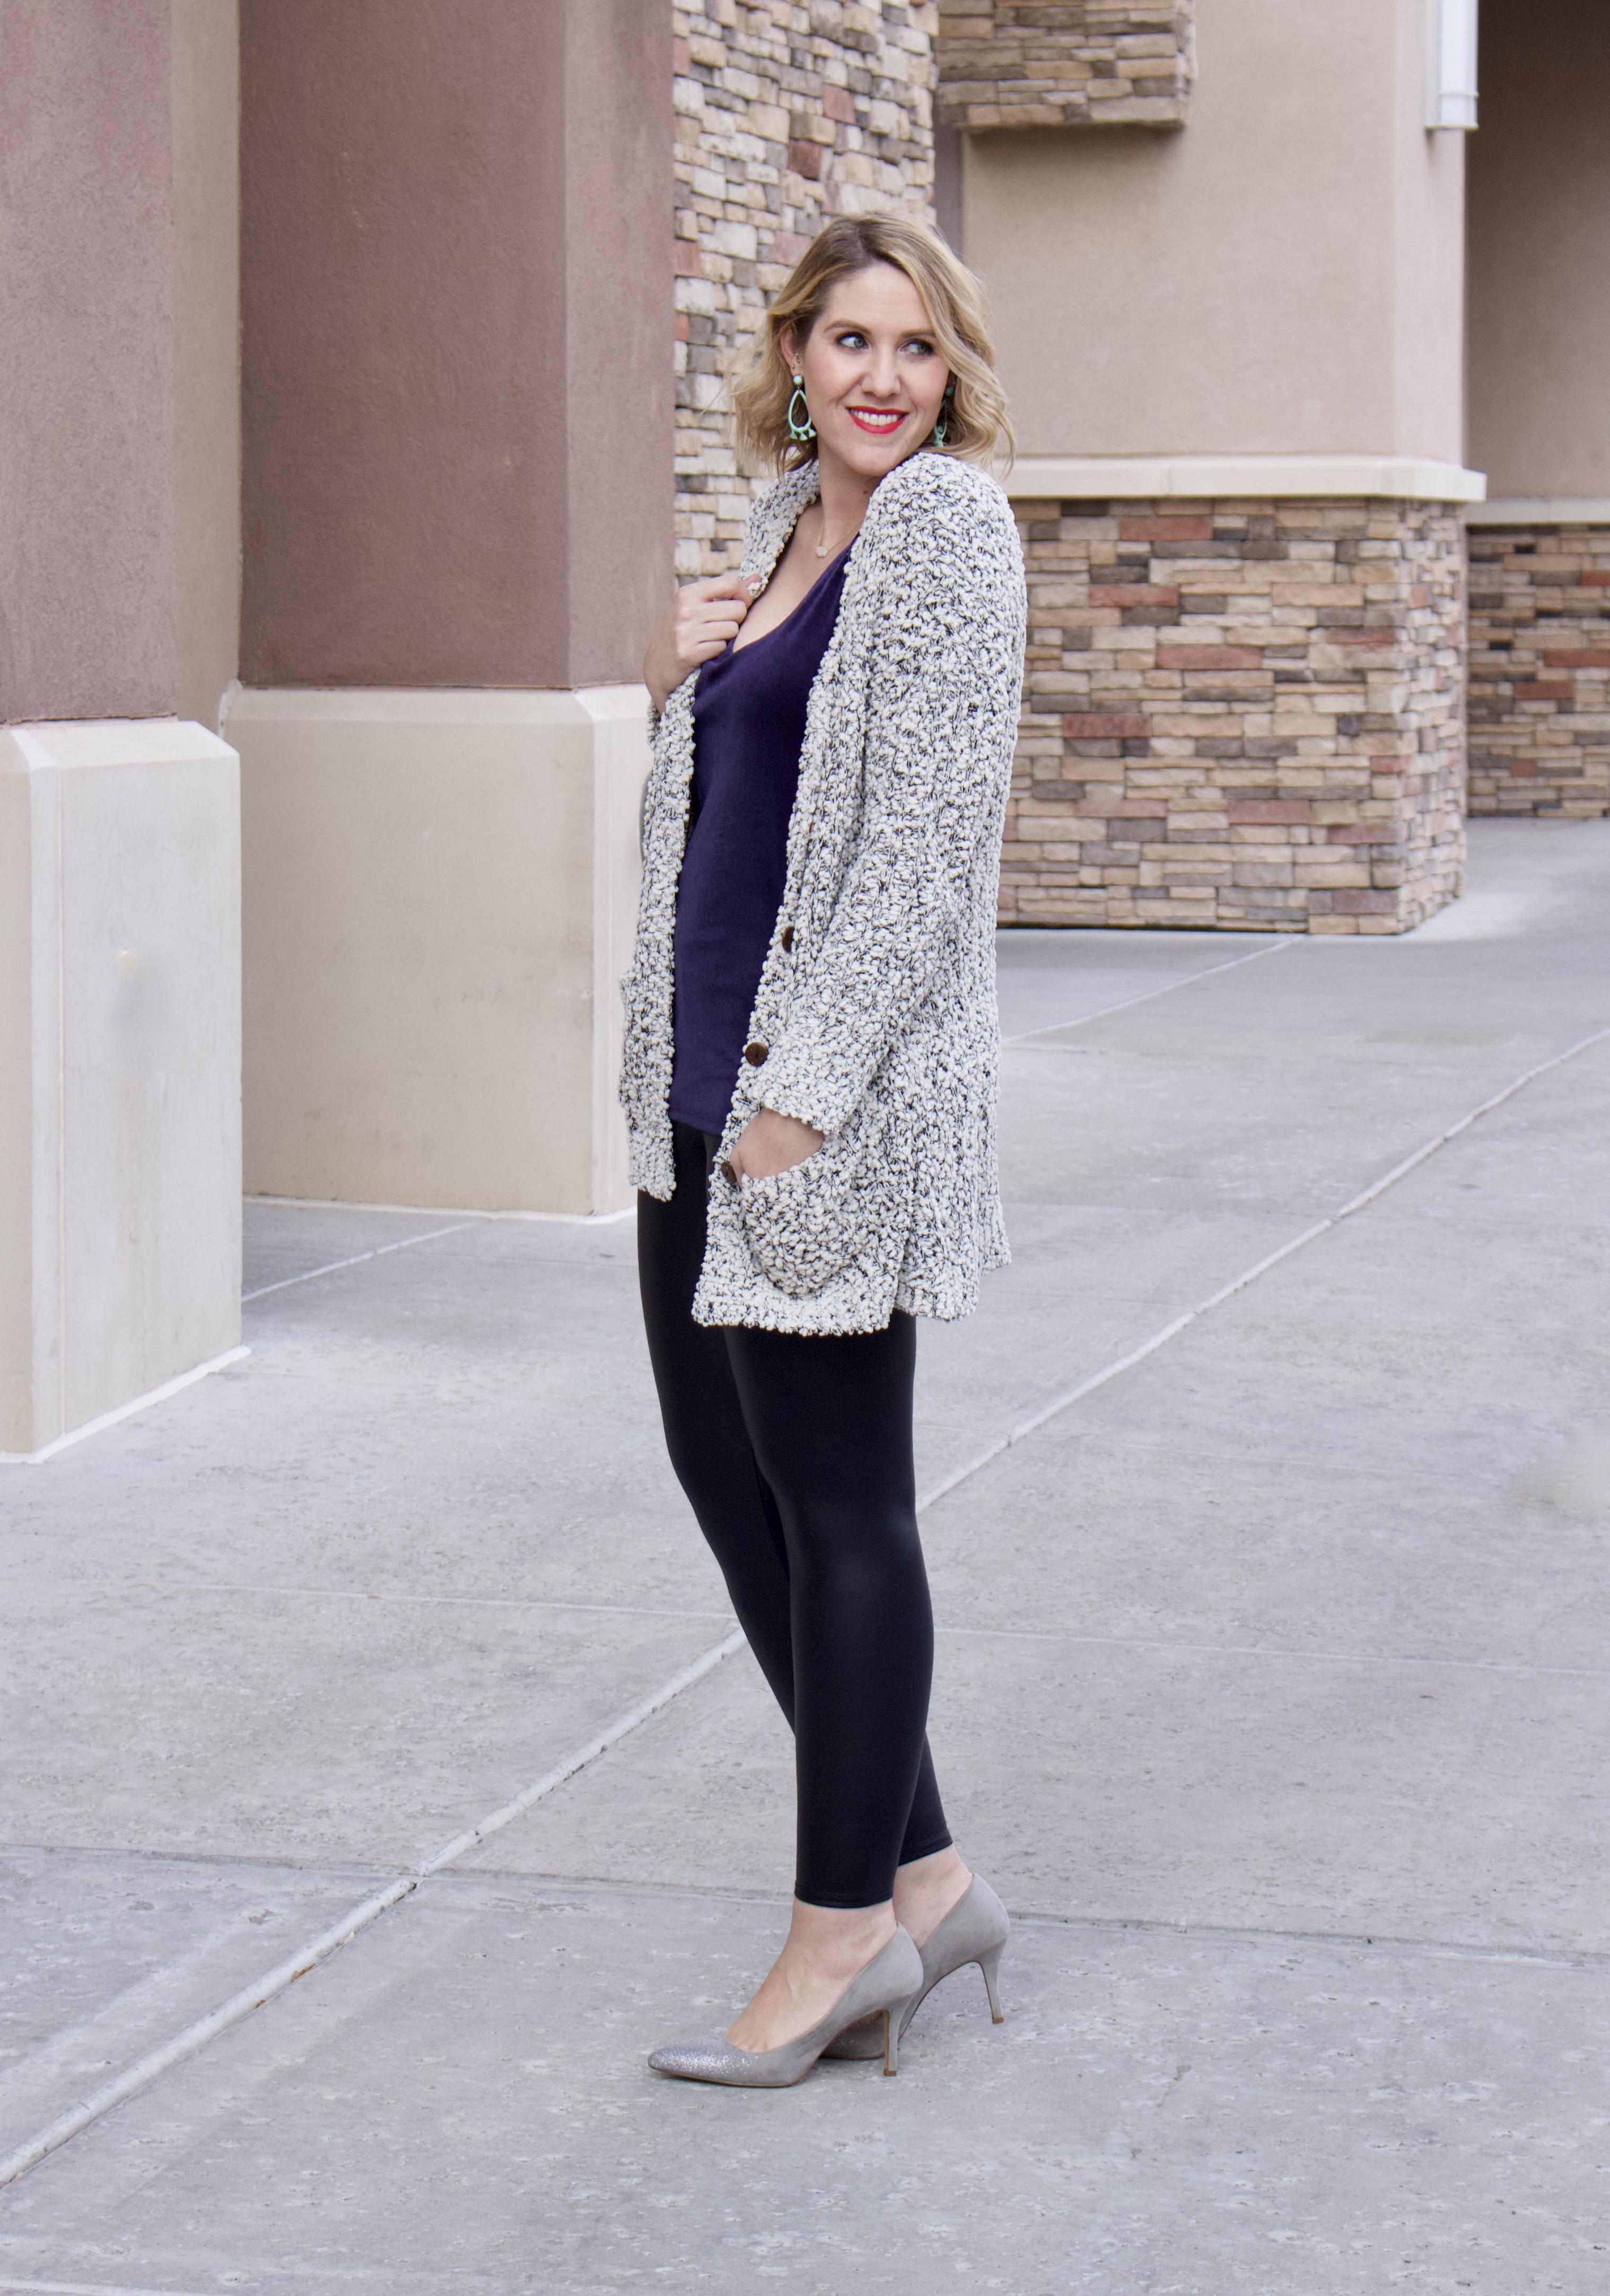 velvet cami cozy cardigan outfit